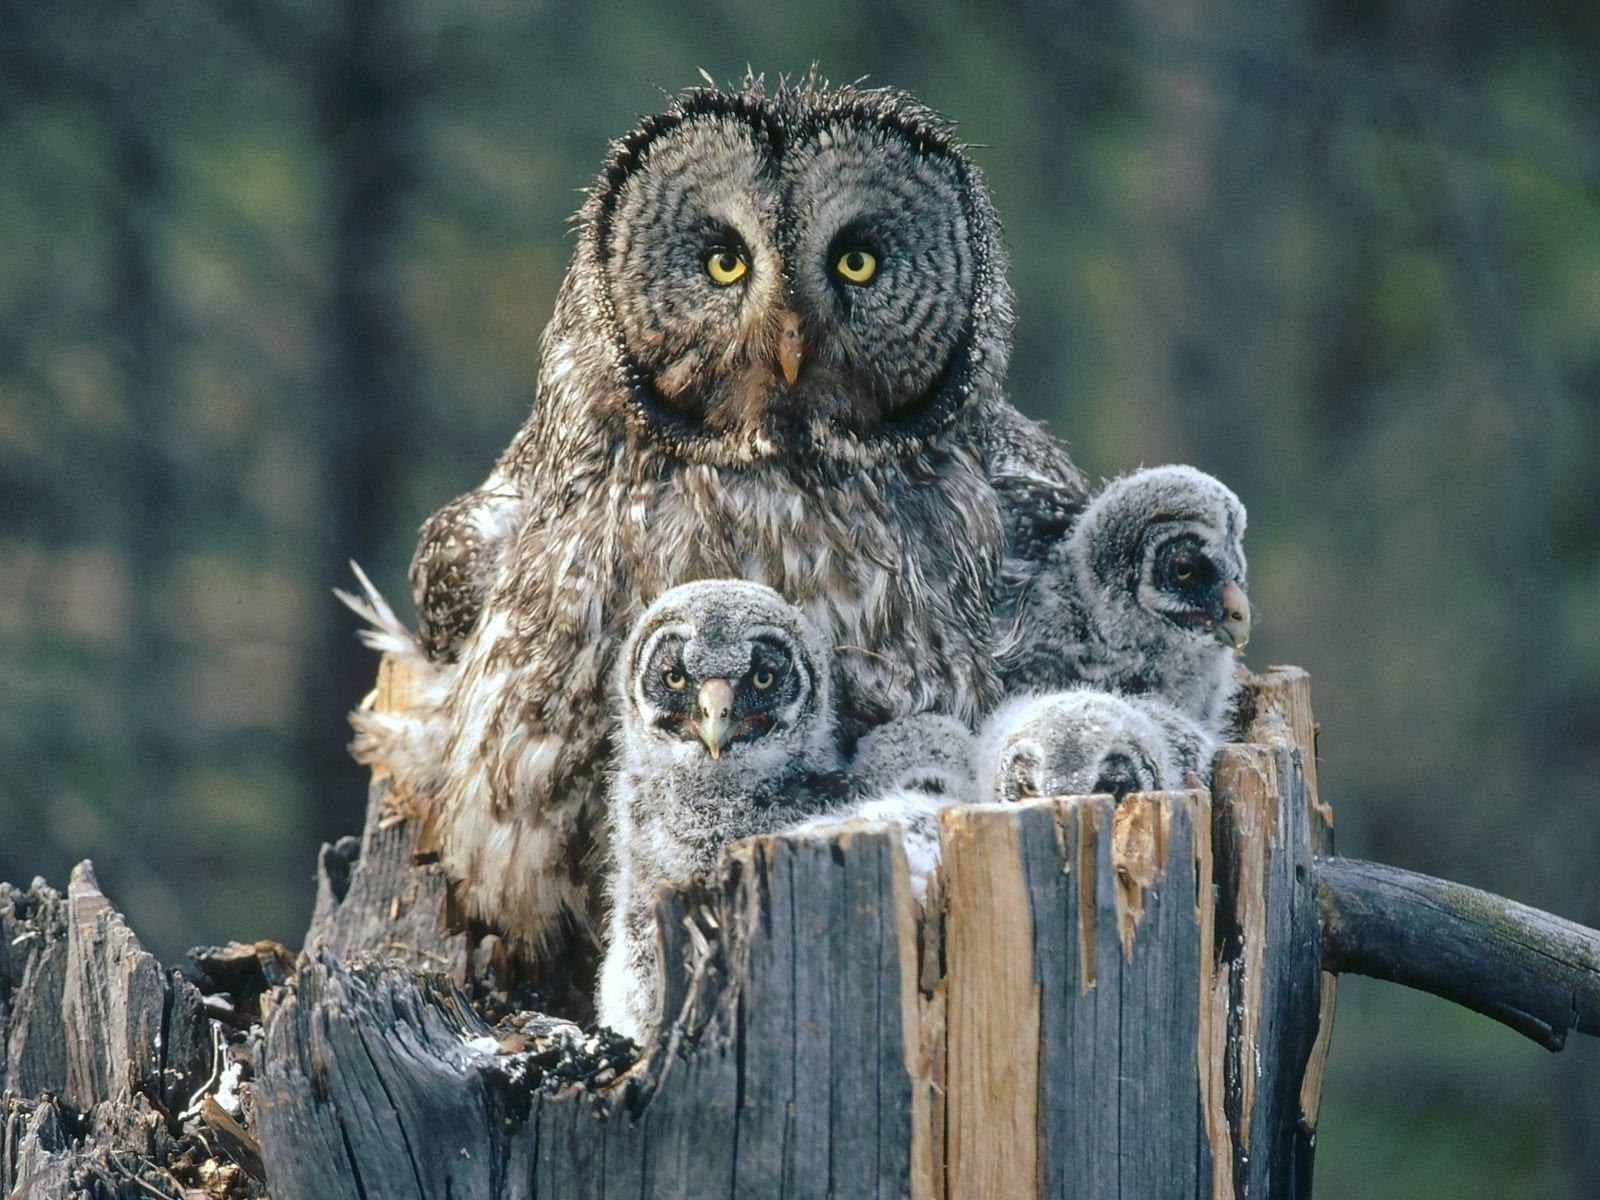 Flying Animal: The Great Grey Owl